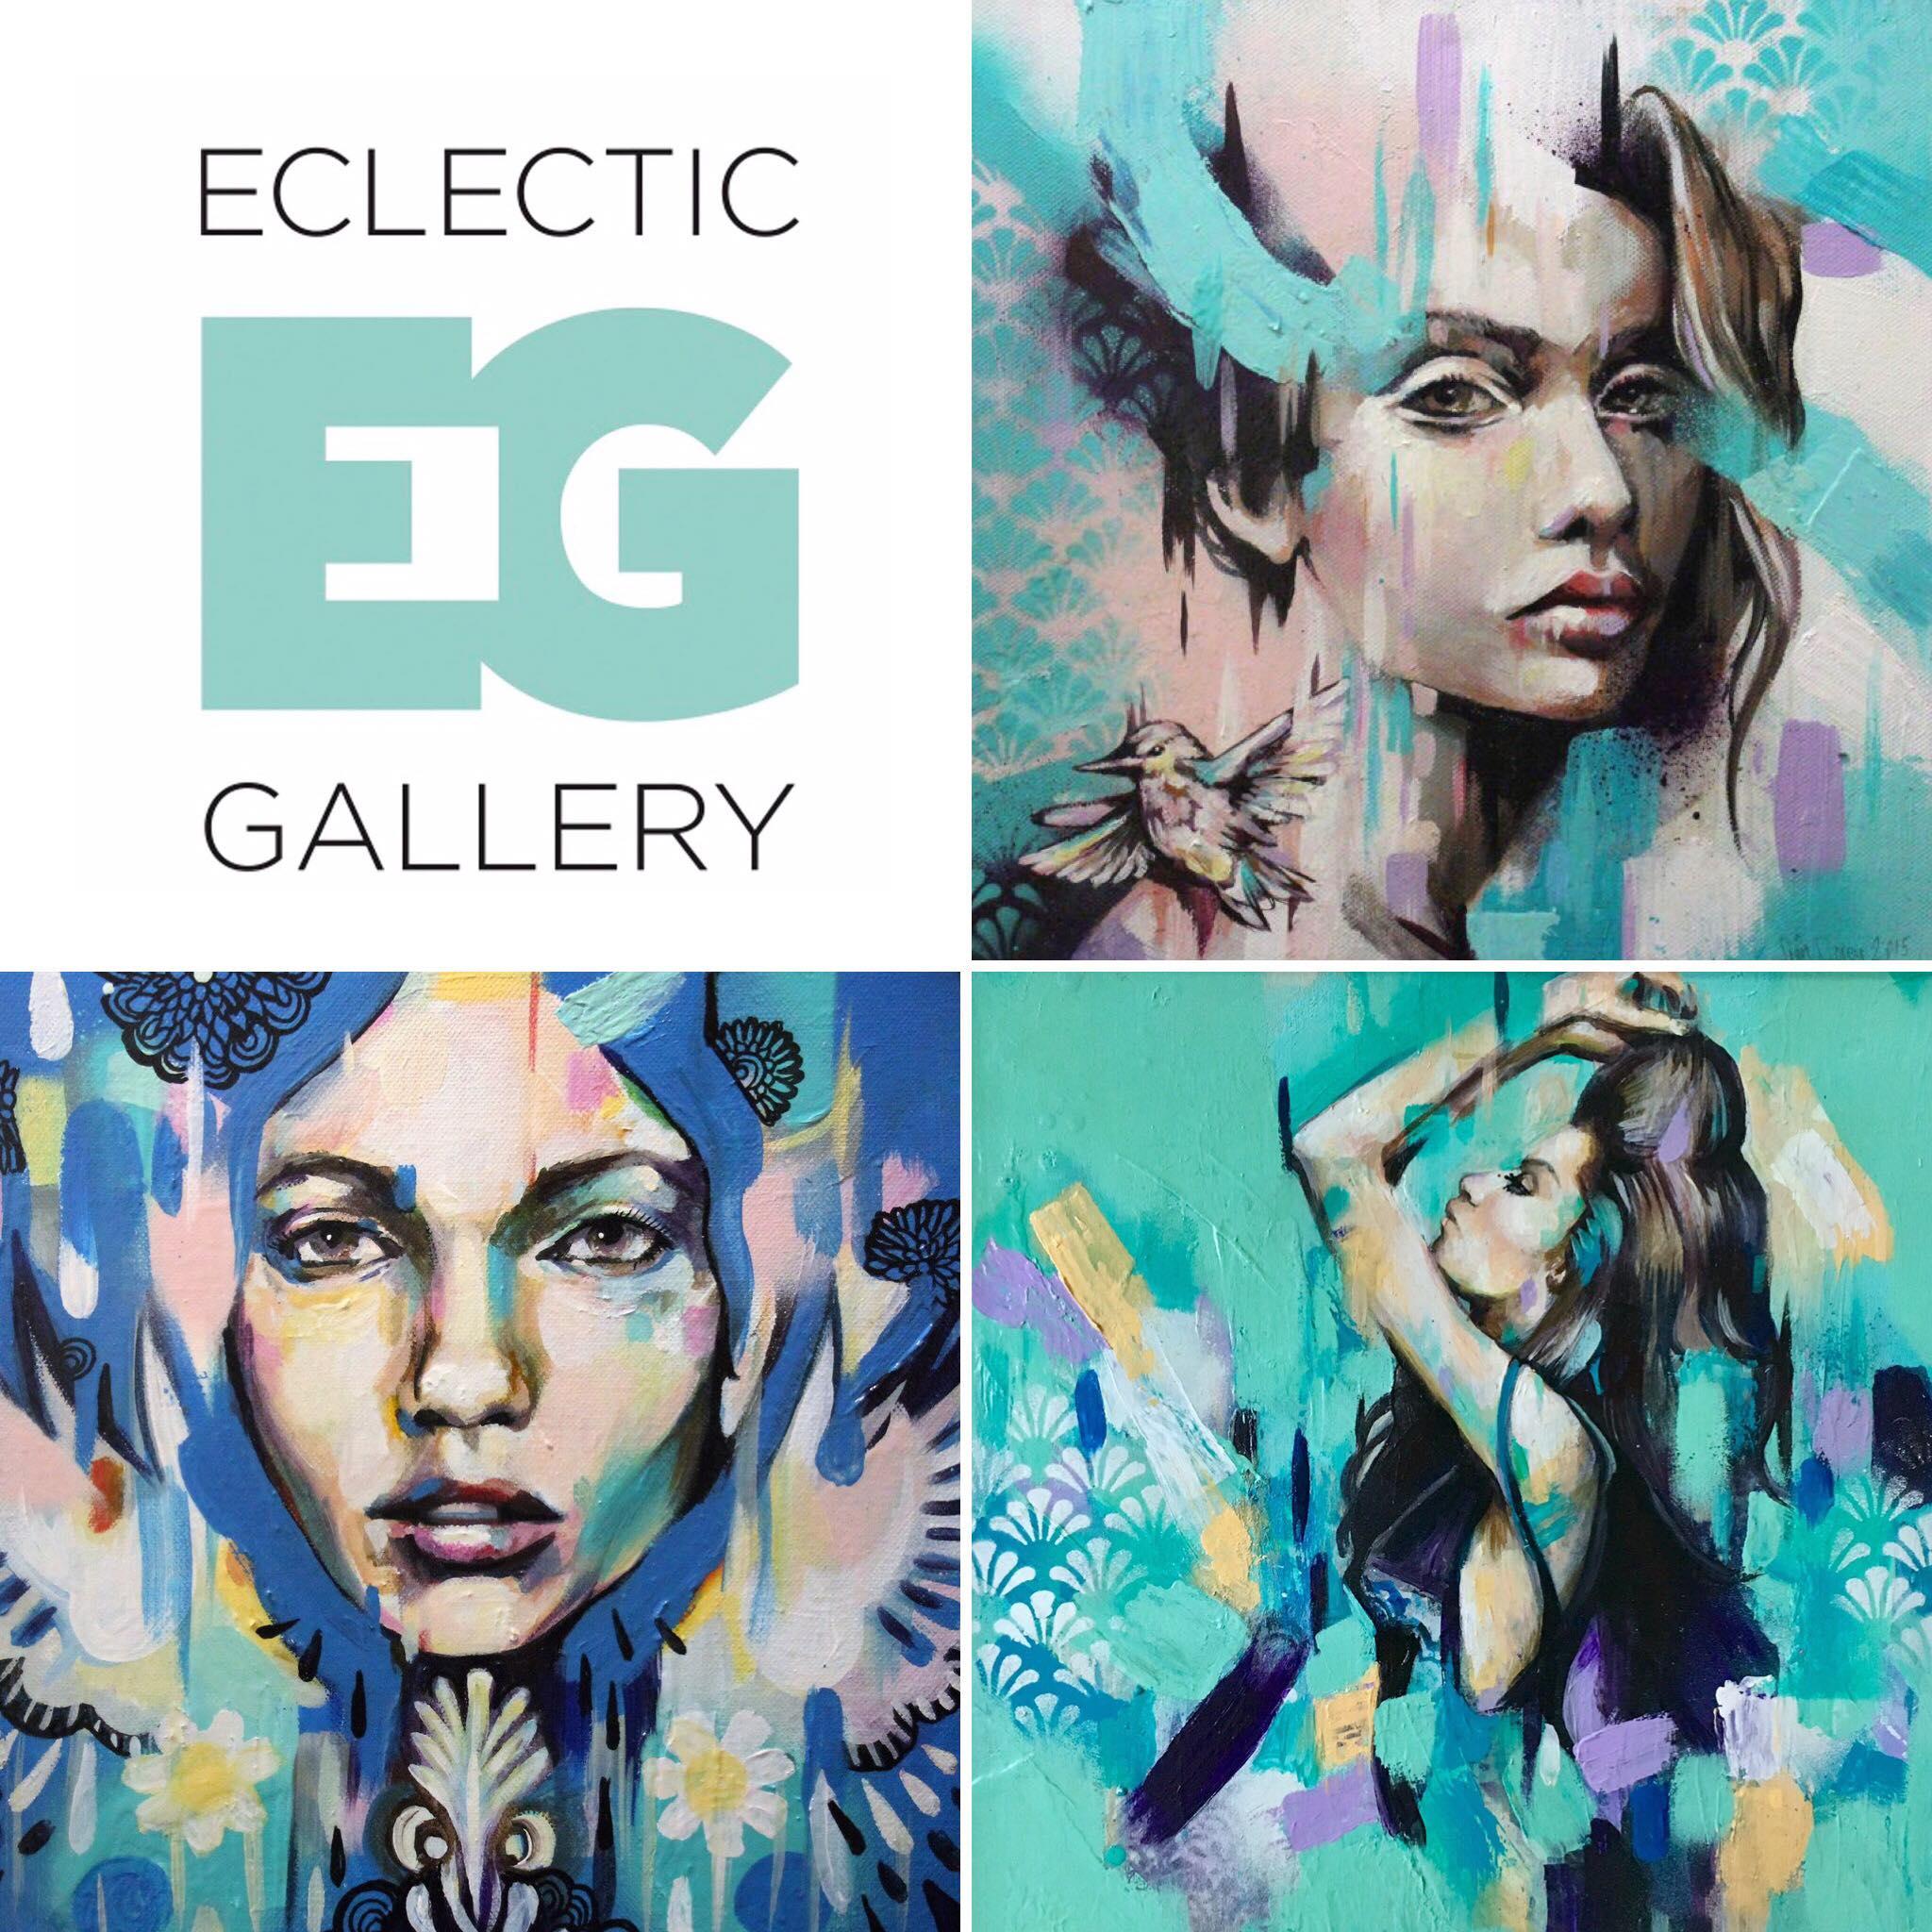 Sian Storey art Eclectic Gallery.jpg